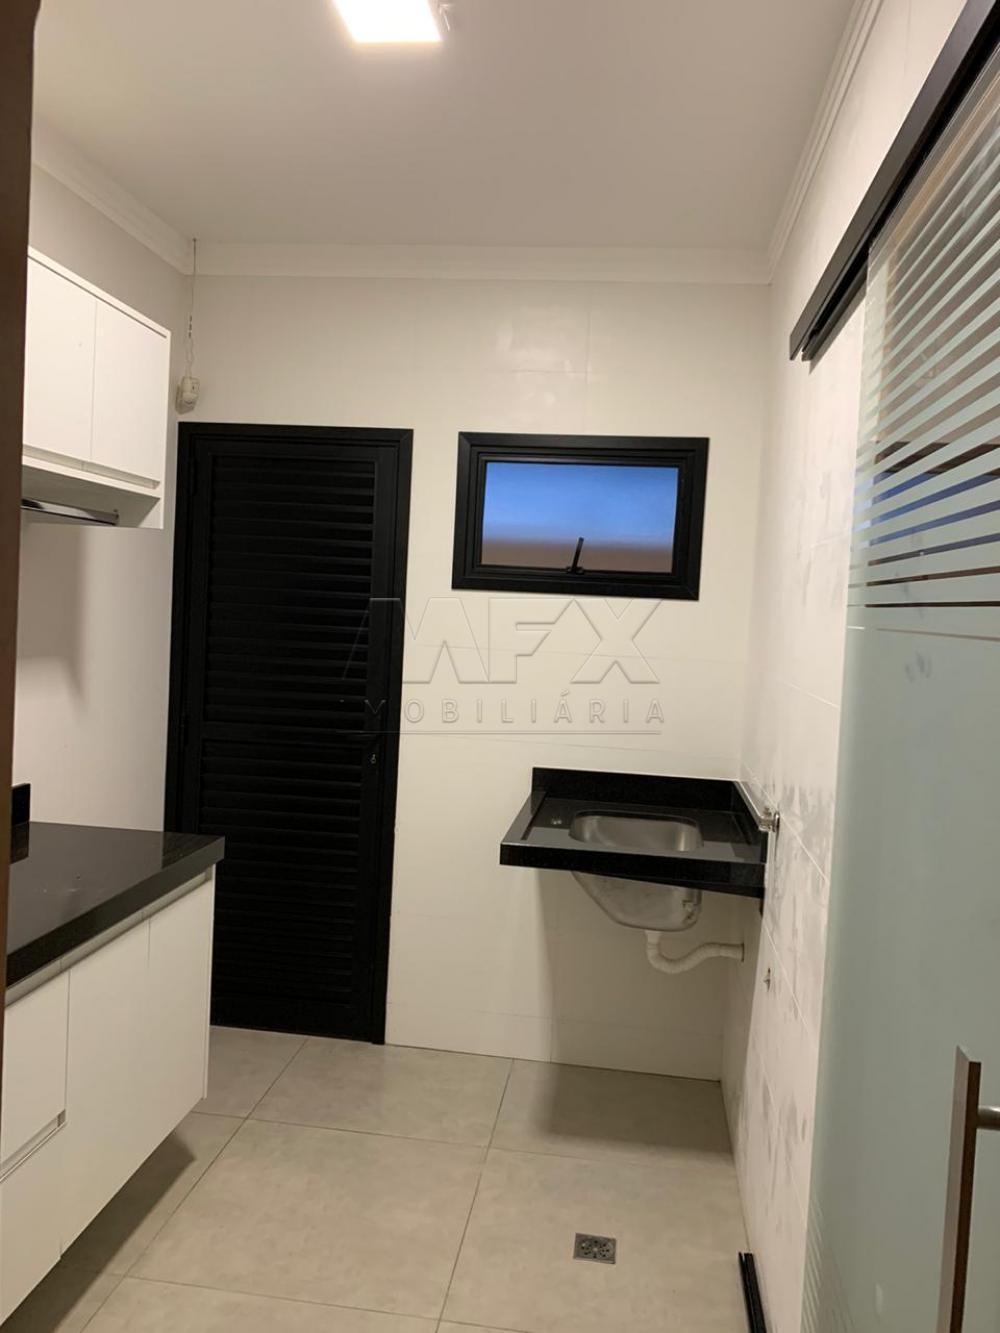 Comprar Casa / Condomínio em Bauru apenas R$ 890.000,00 - Foto 5